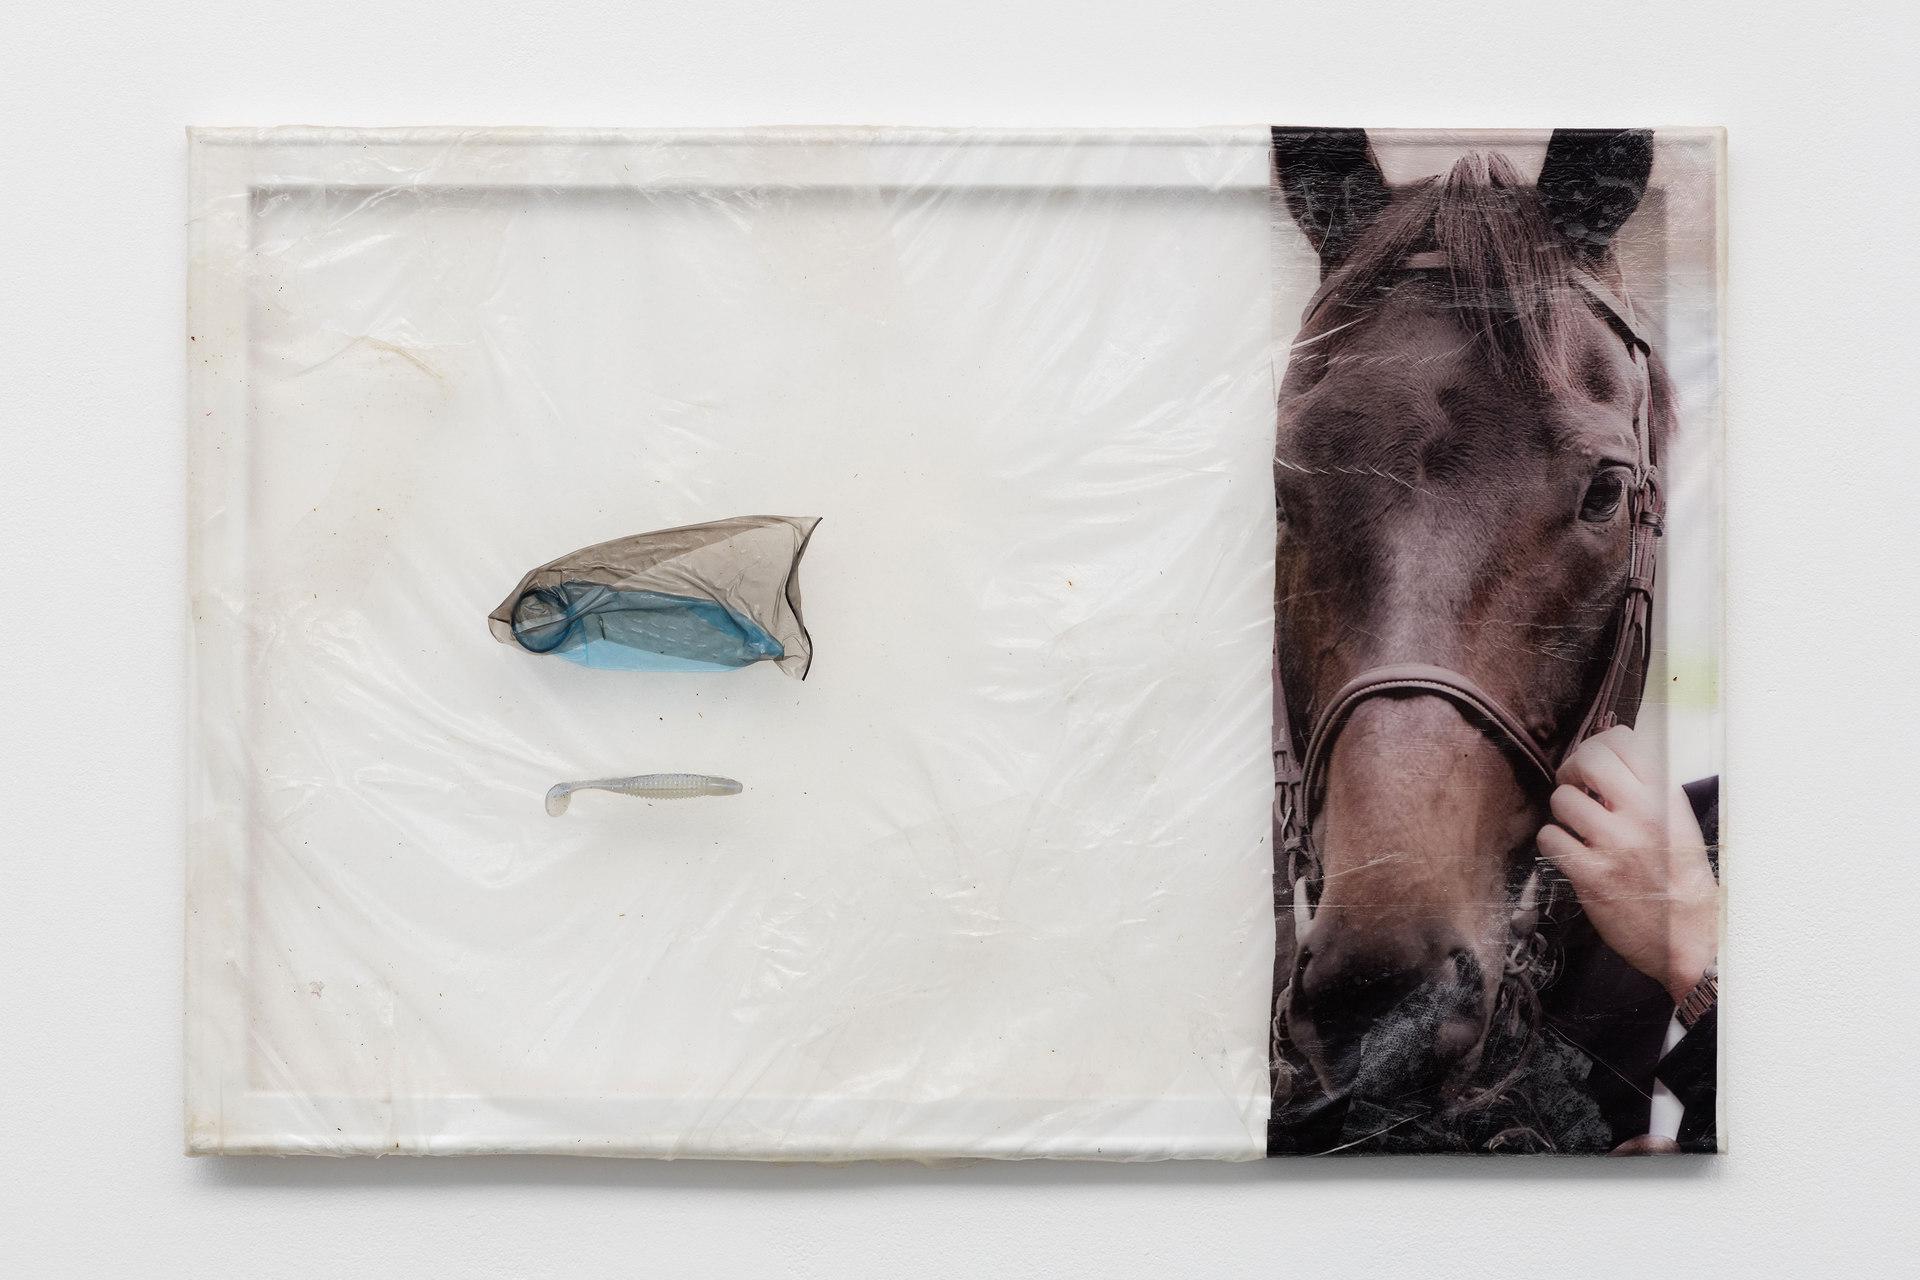 Aude Pariset, GREENHOUSES, 'Stallion Dad', Bioplastic, UV print on bioplastic, condoms, fish bait, wood, paint, 60 x 90cm, 2016, Cell Project Space